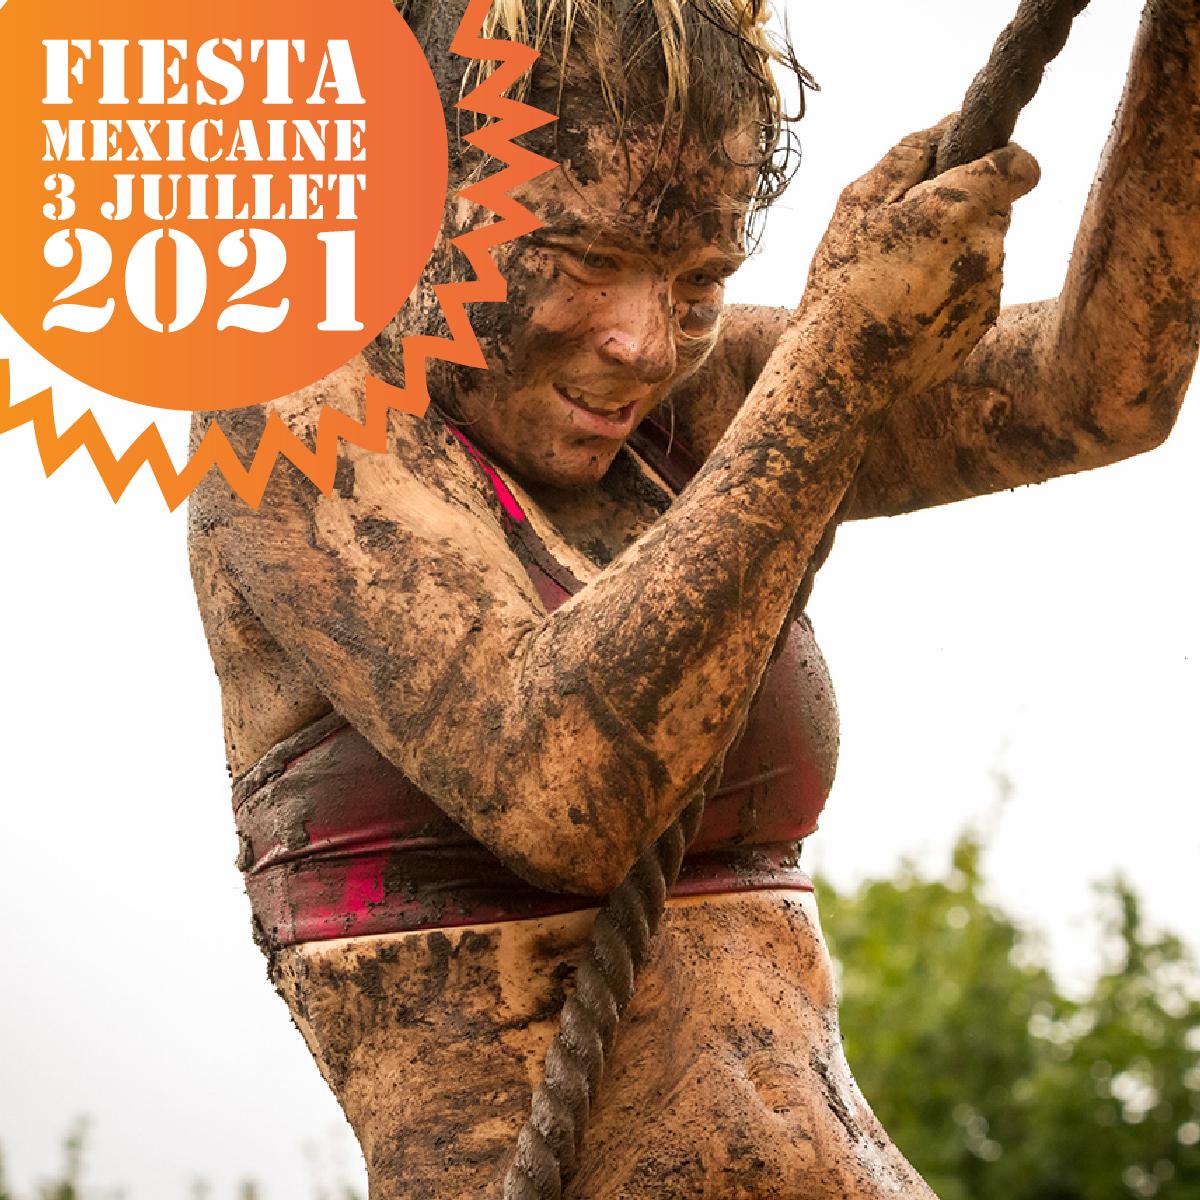 Fiesta mexicaine Basebootcamp